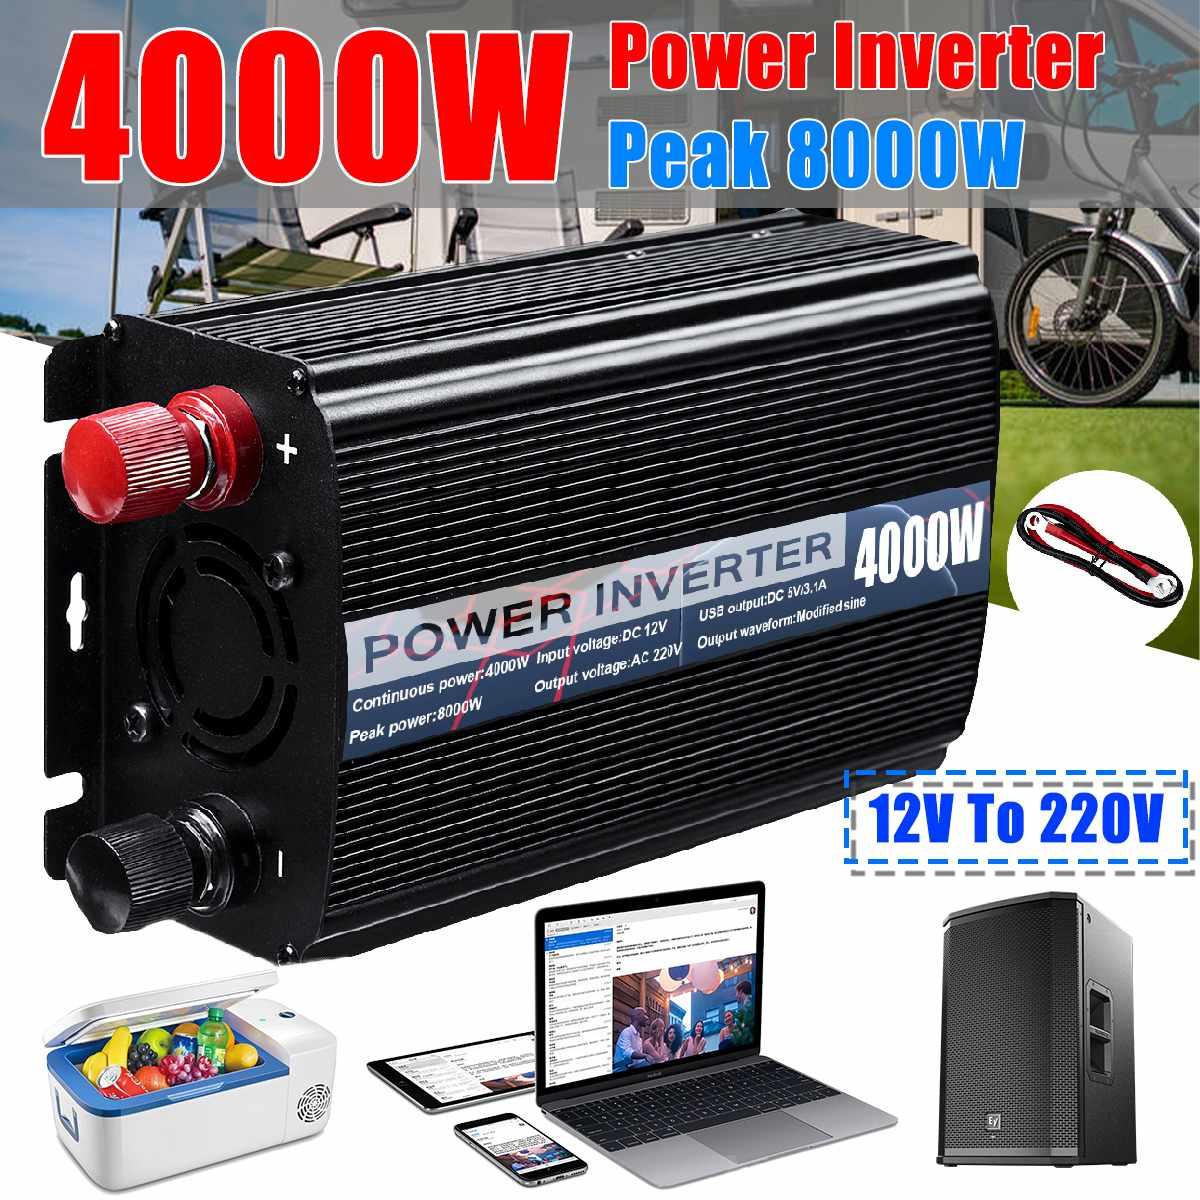 Eficiente Dual USB Max 8000W cc 12V a CA 220V inversor de corriente del coche cargador adaptador transformador de onda sinusoidal modificada 4000W